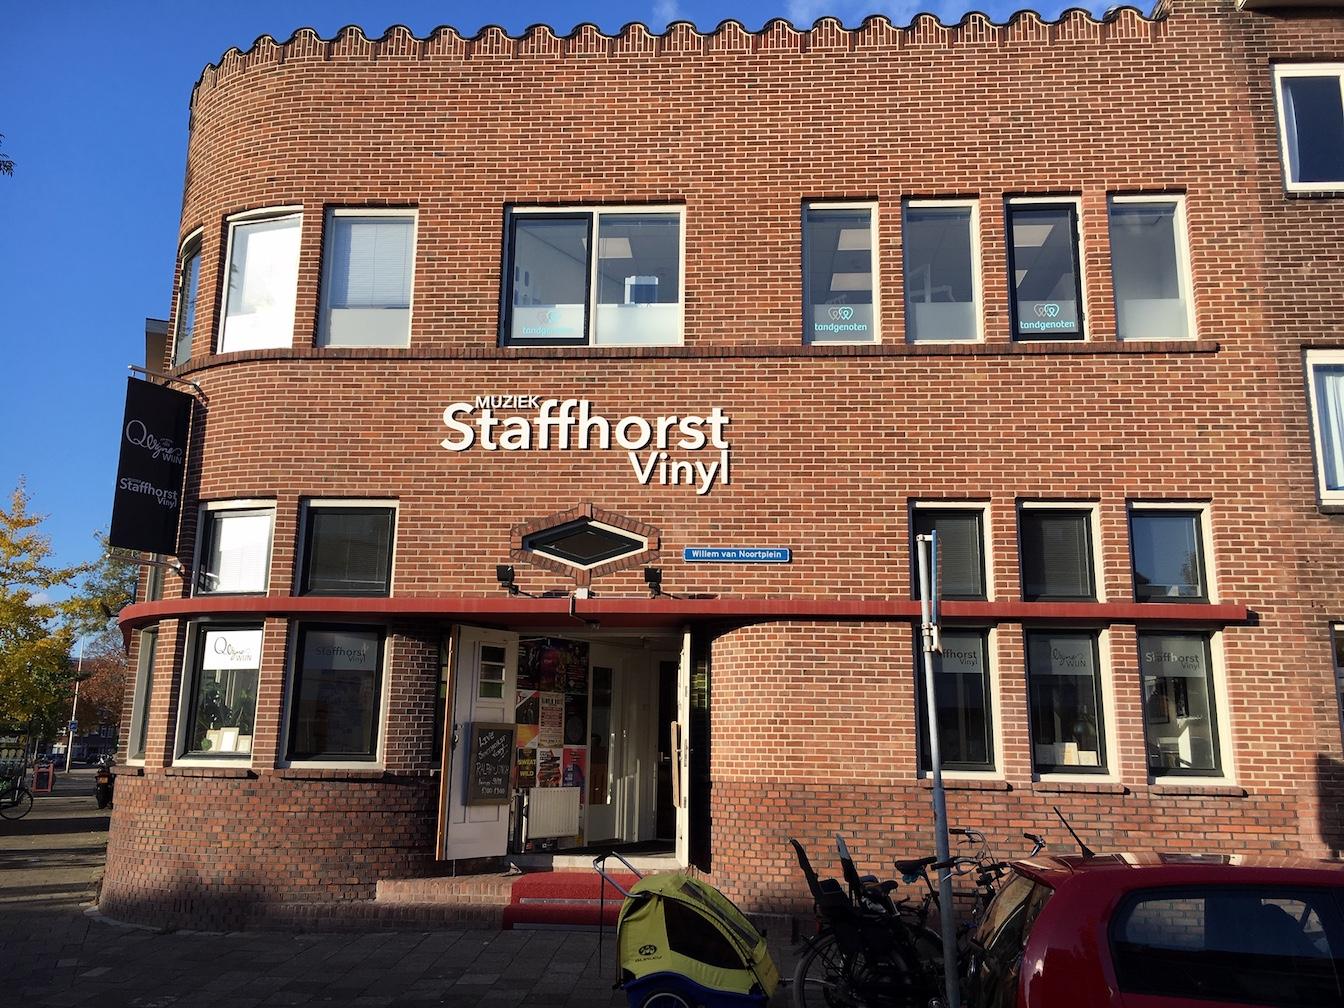 Muziek Staffhorst Vinyl Utrecht Record Shops